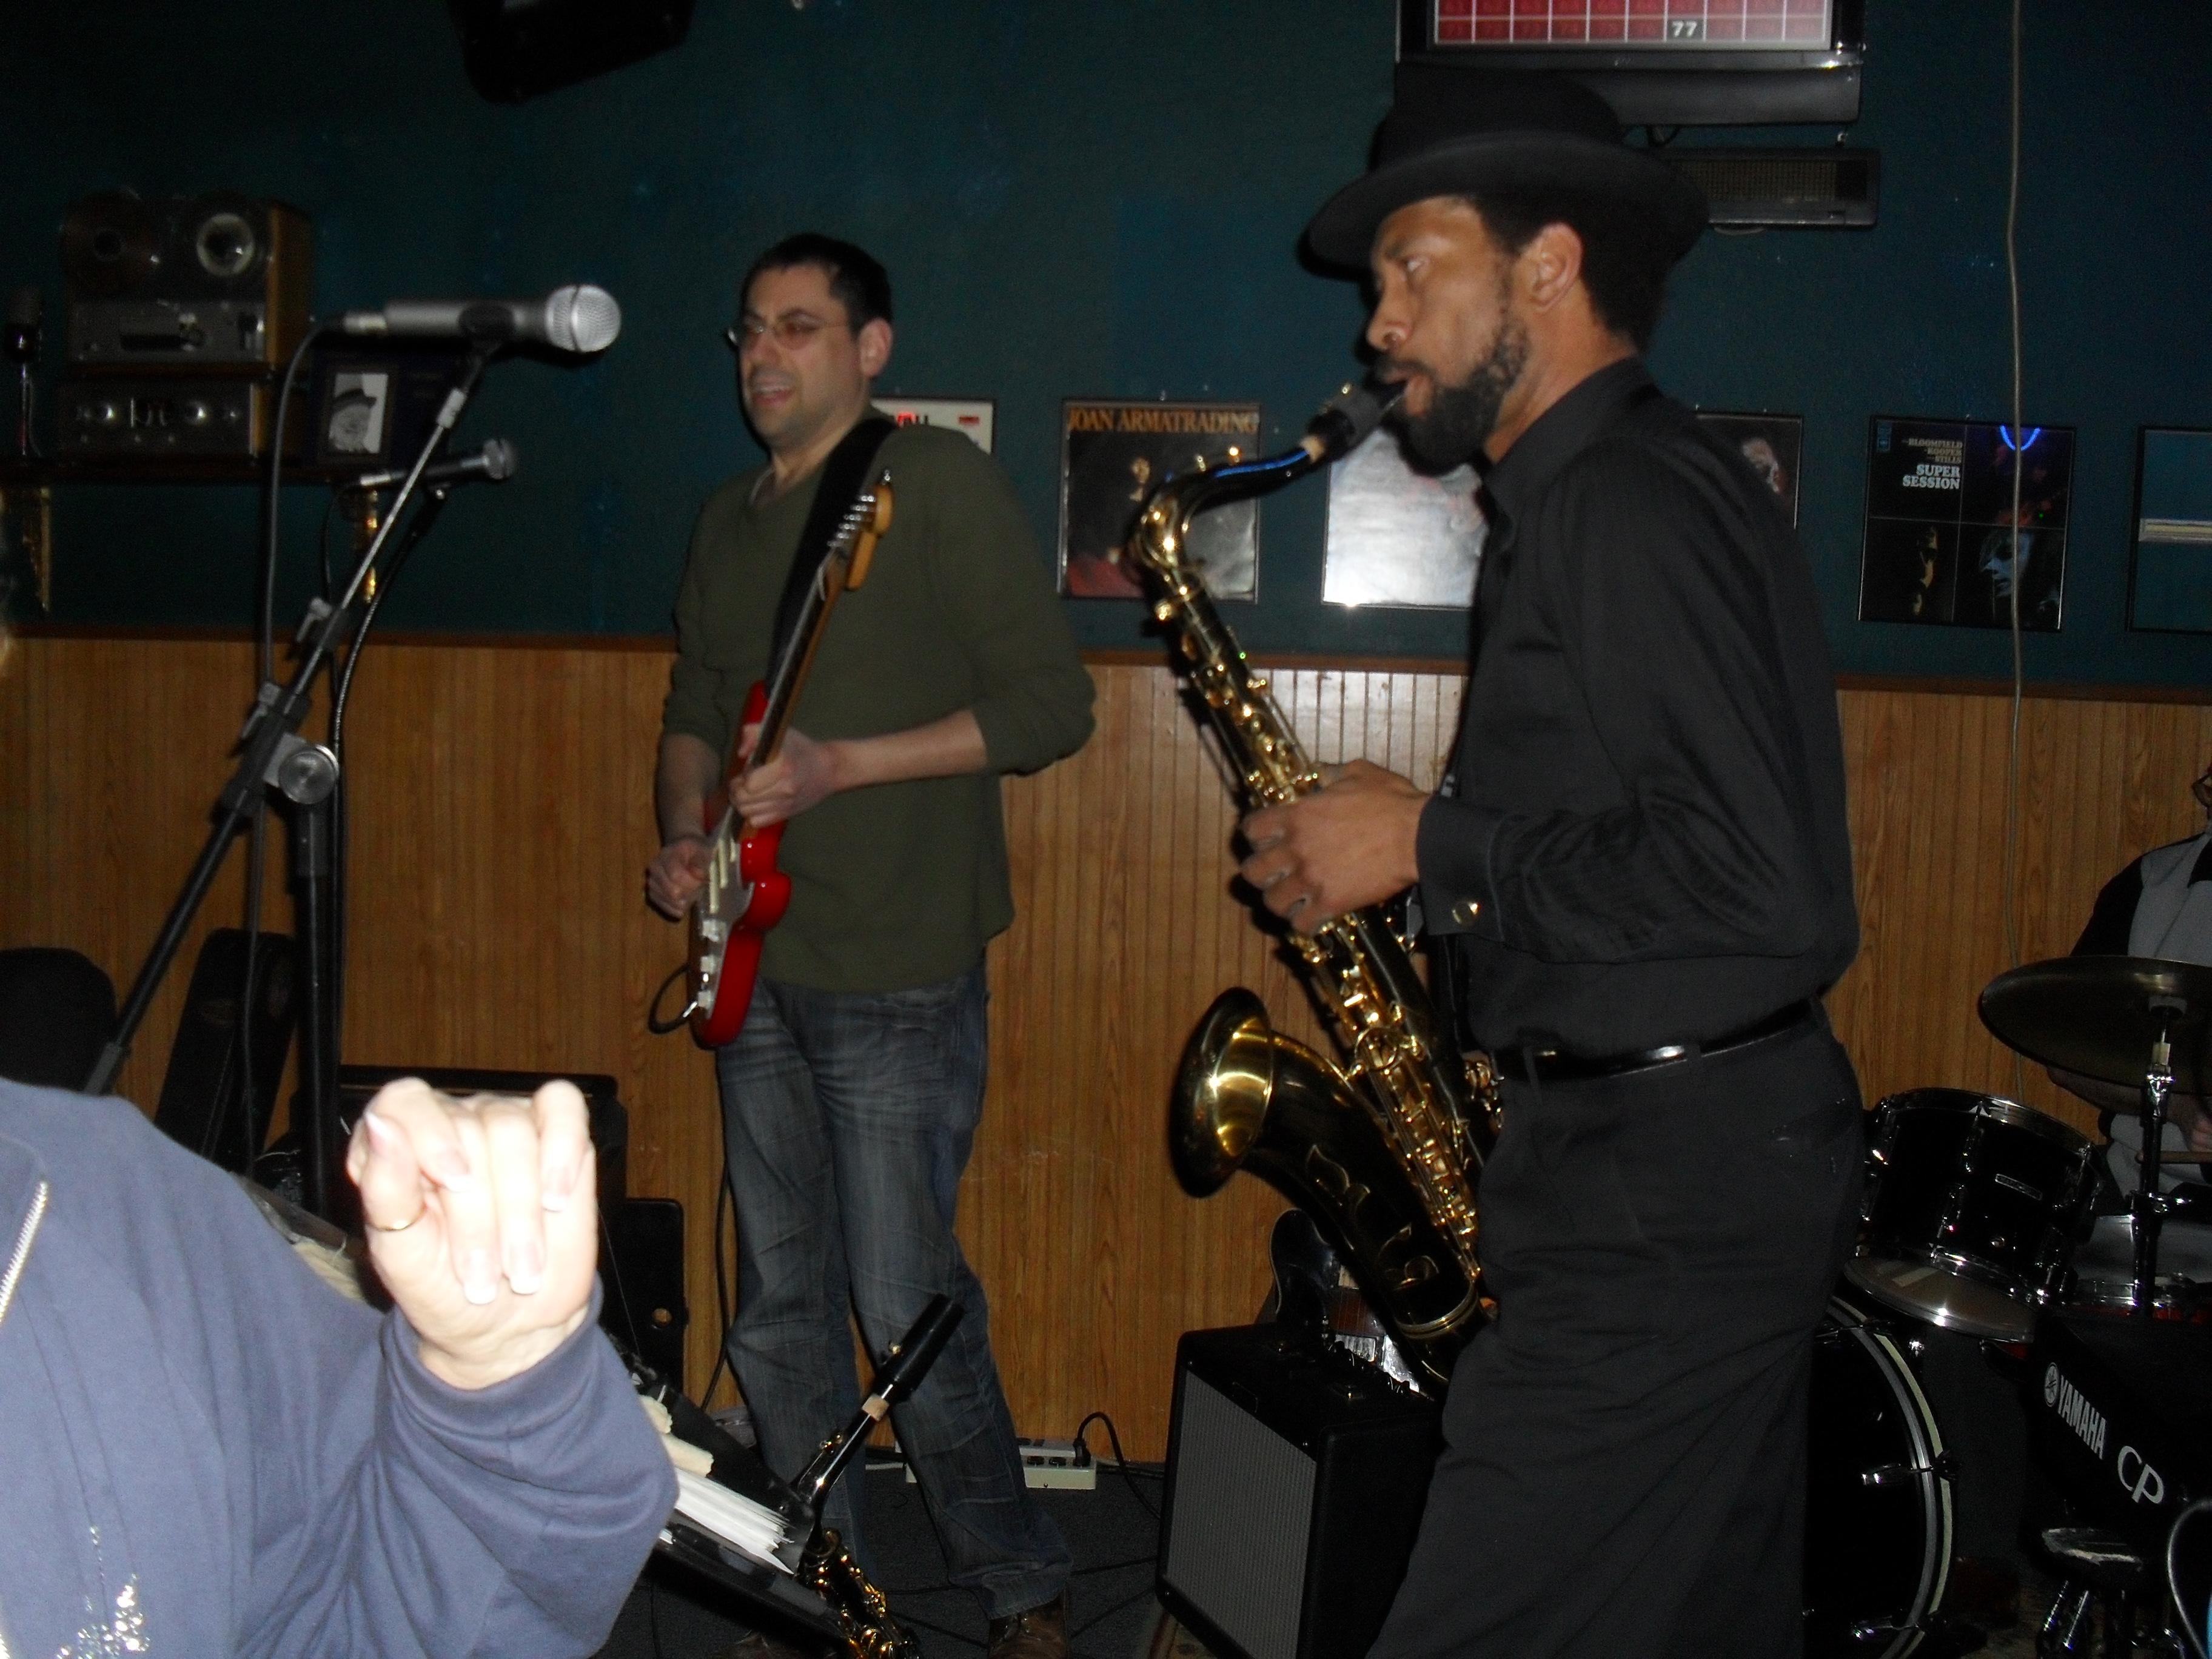 Blue Diamond jam session - Portland, OR. In photo: Fenix